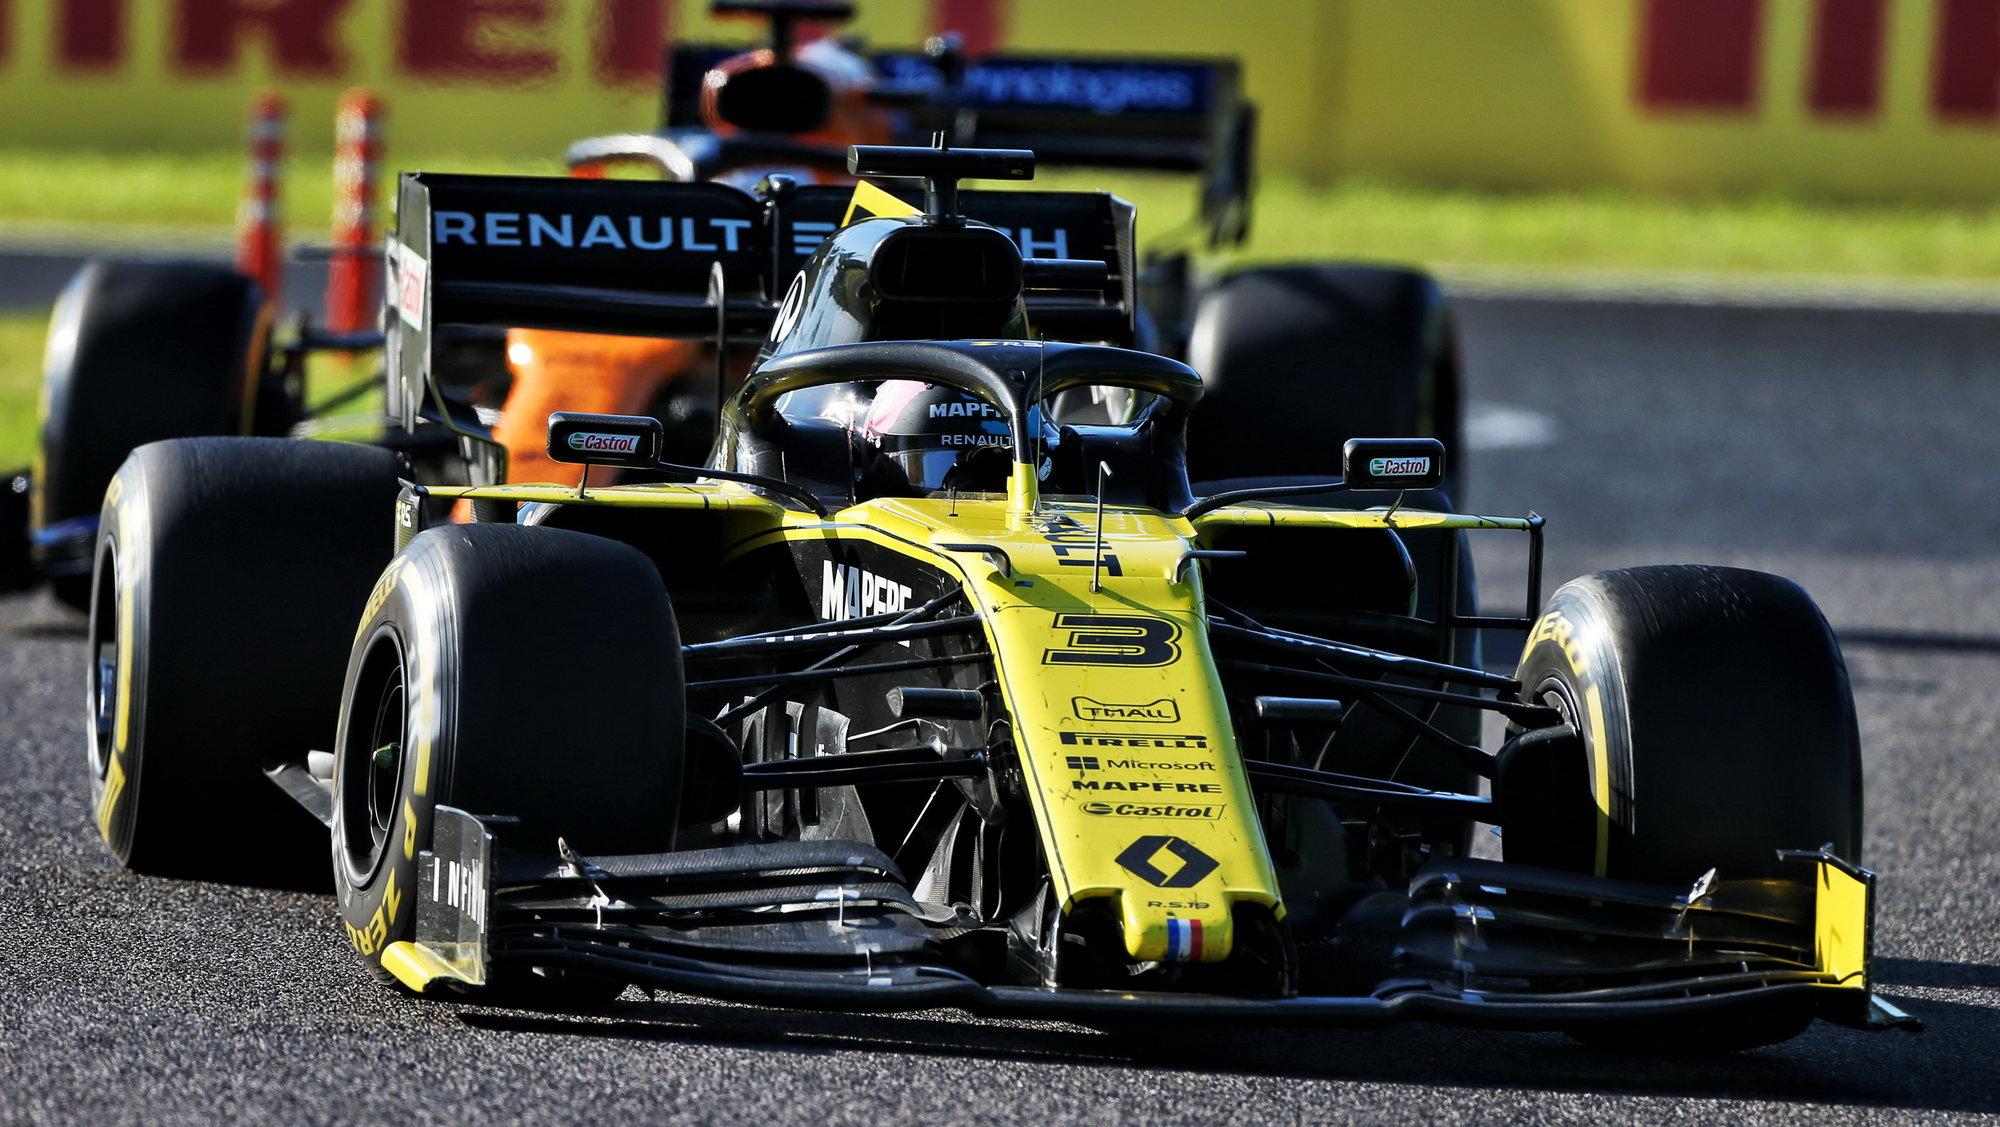 Daniel Ricciardo v Suzuce před McLarenem Carlose Sainze